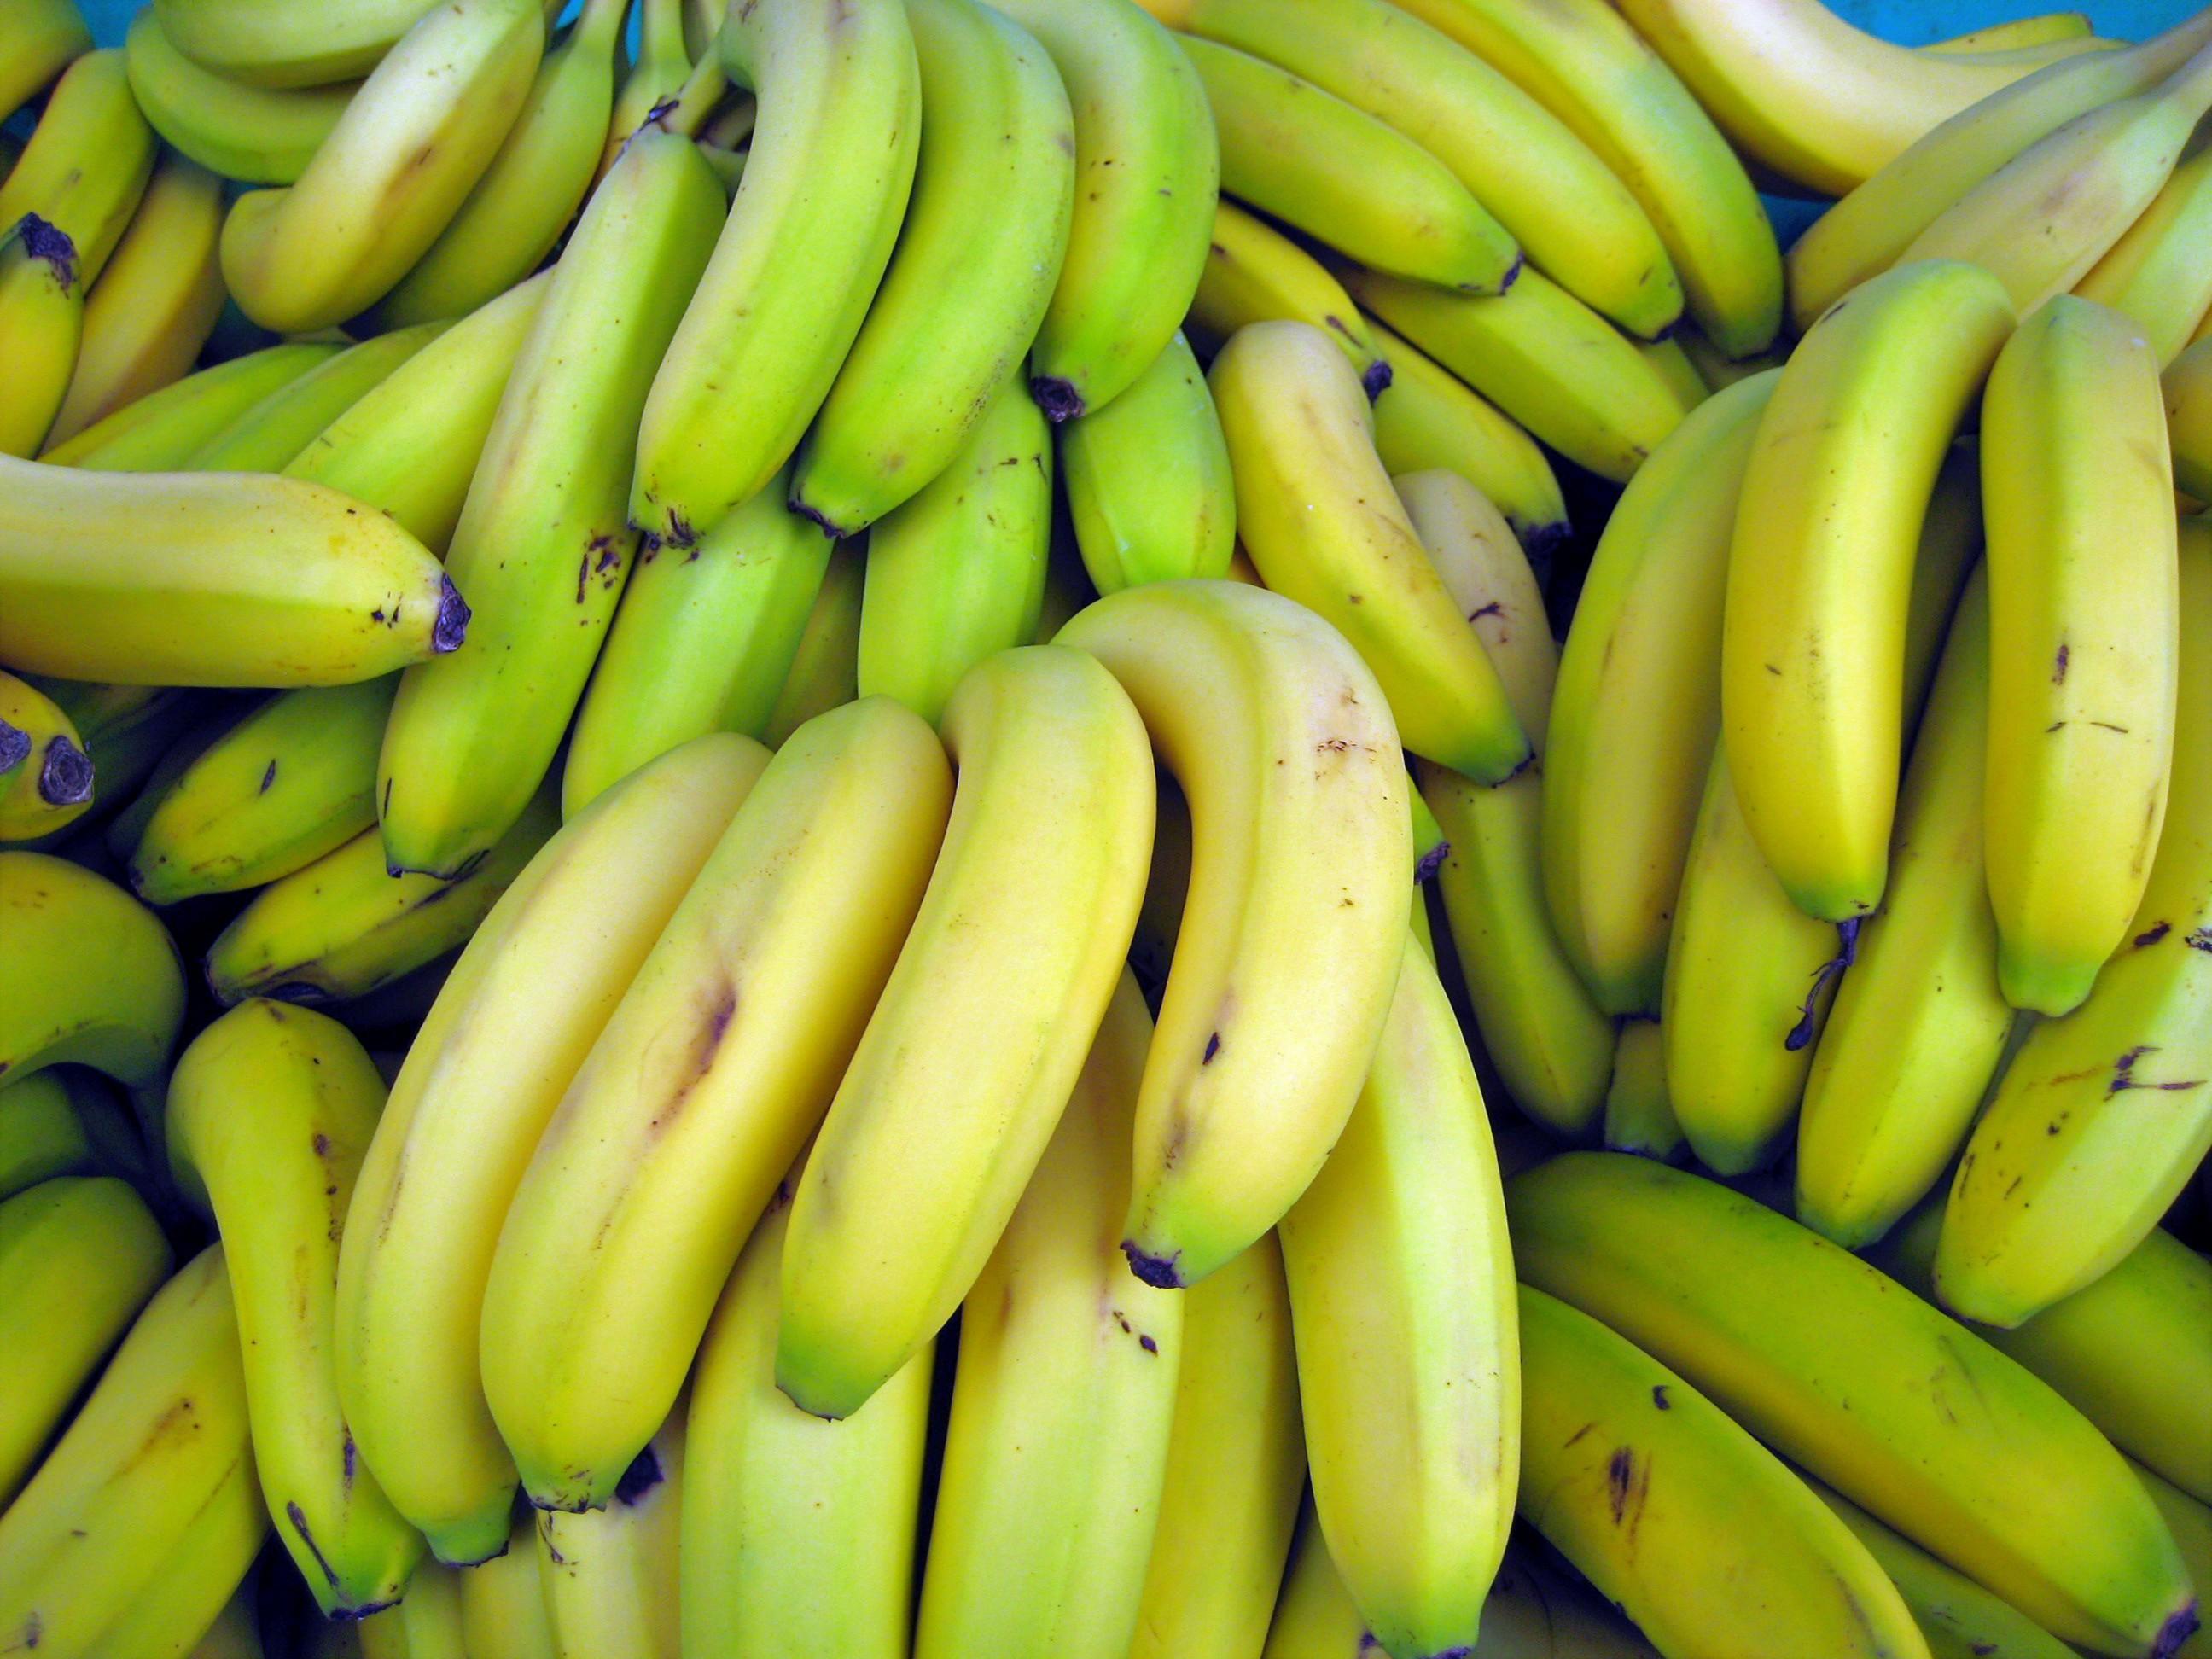 CW-Bananas